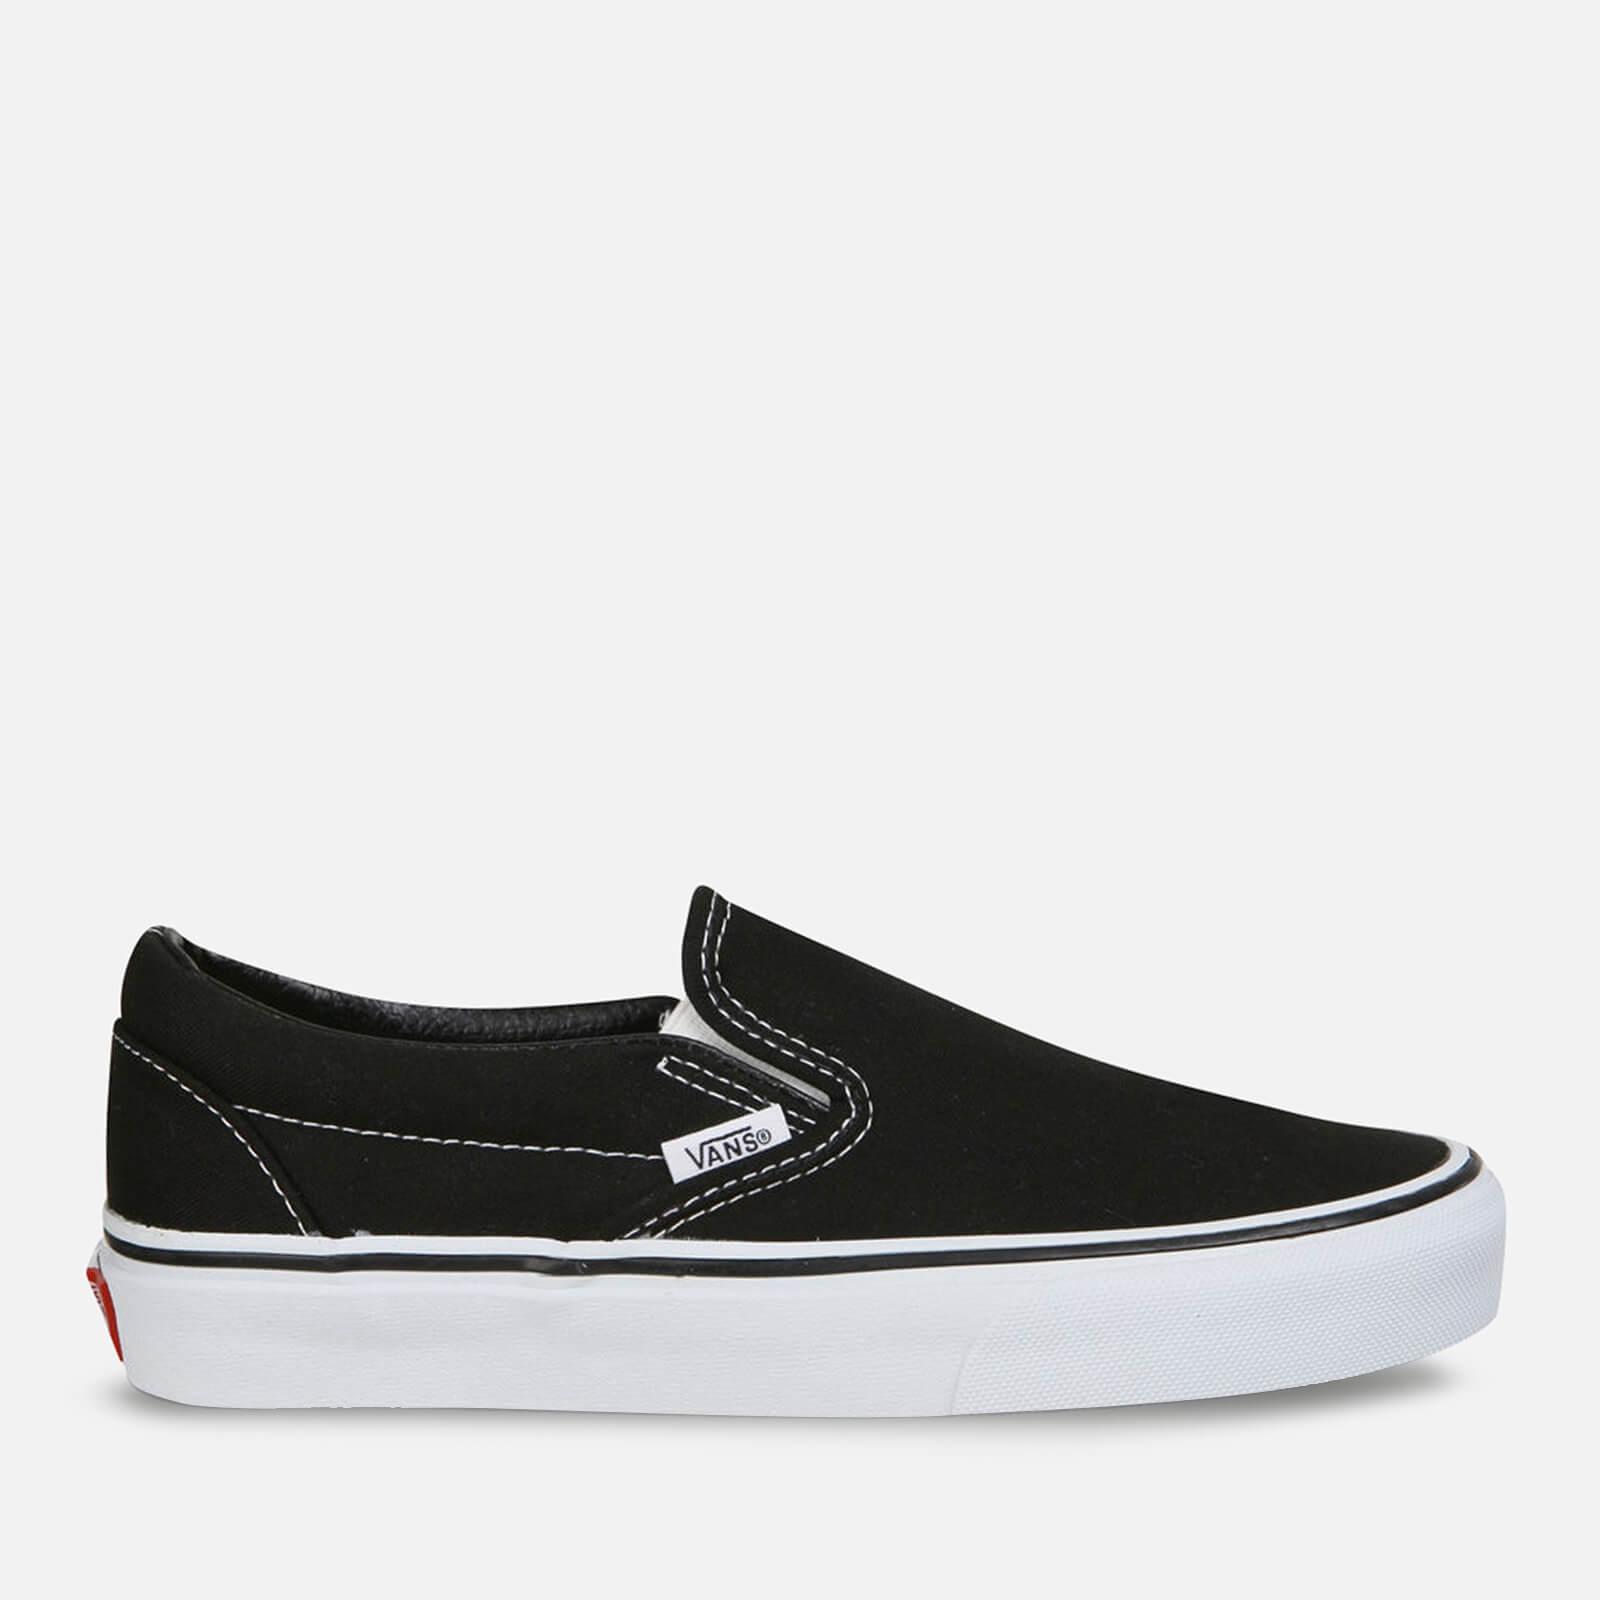 Vans Classic Slip-On Trainers - Black - UK 8